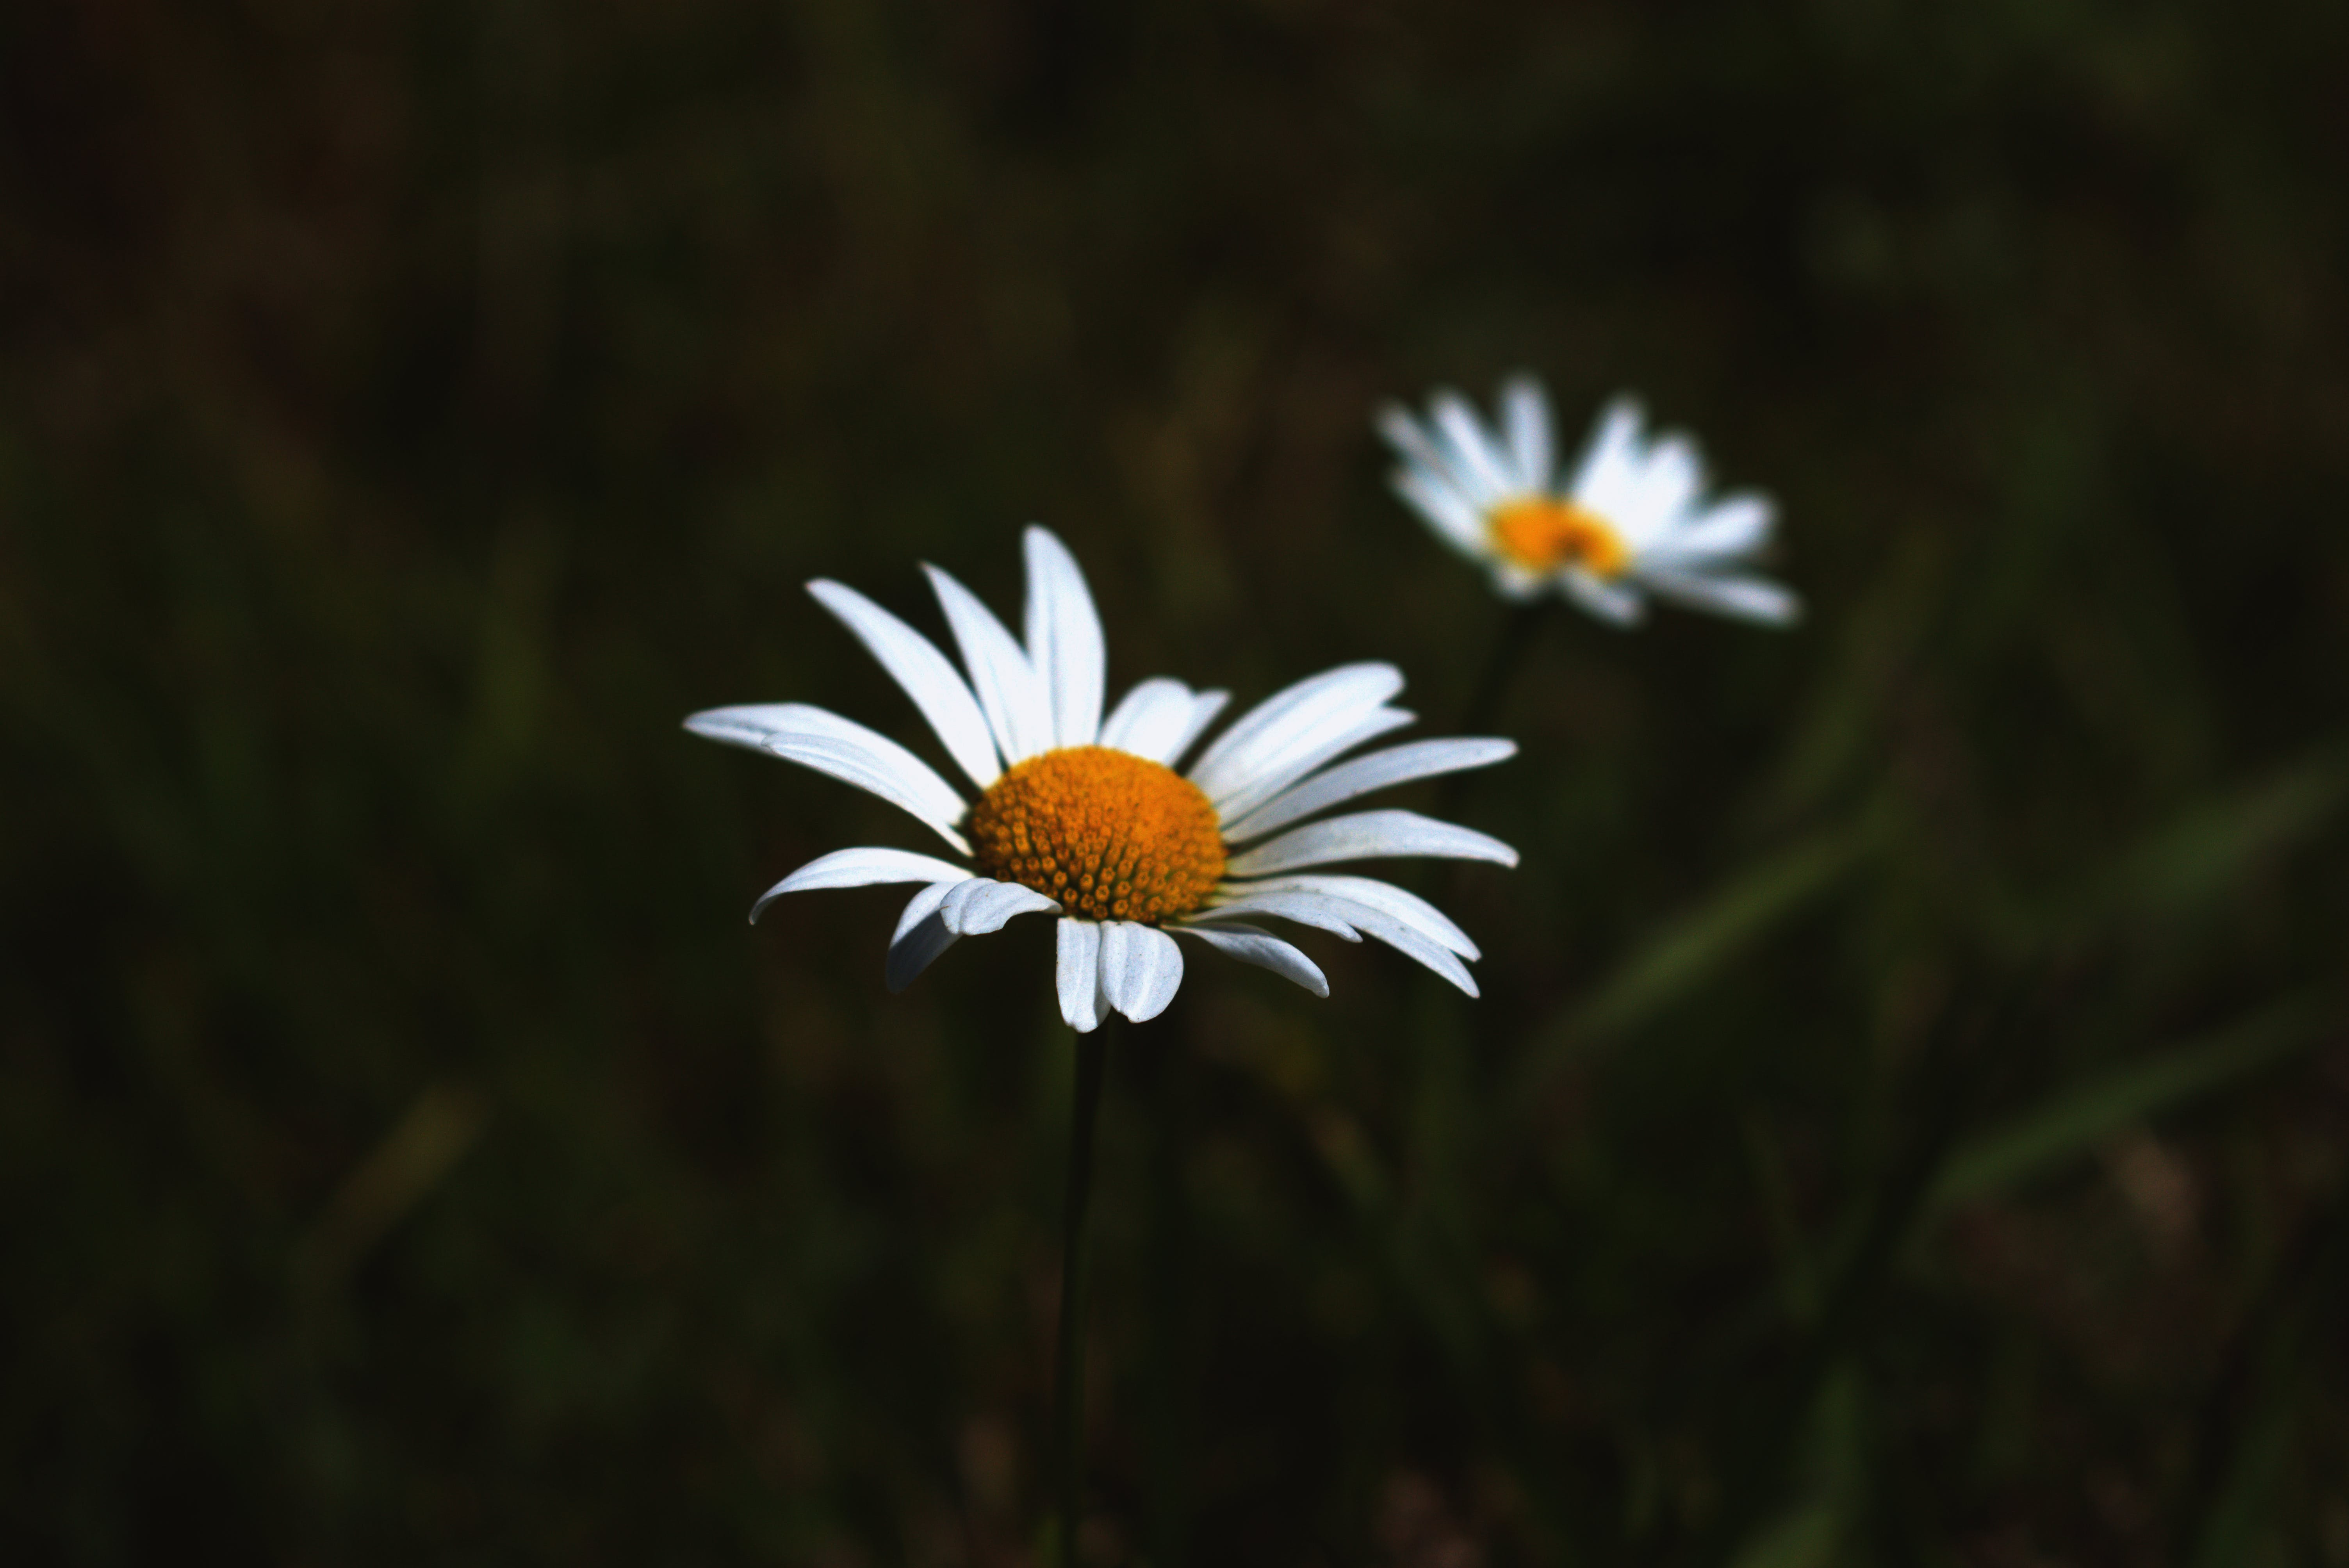 Close-up Photo of White Daisies